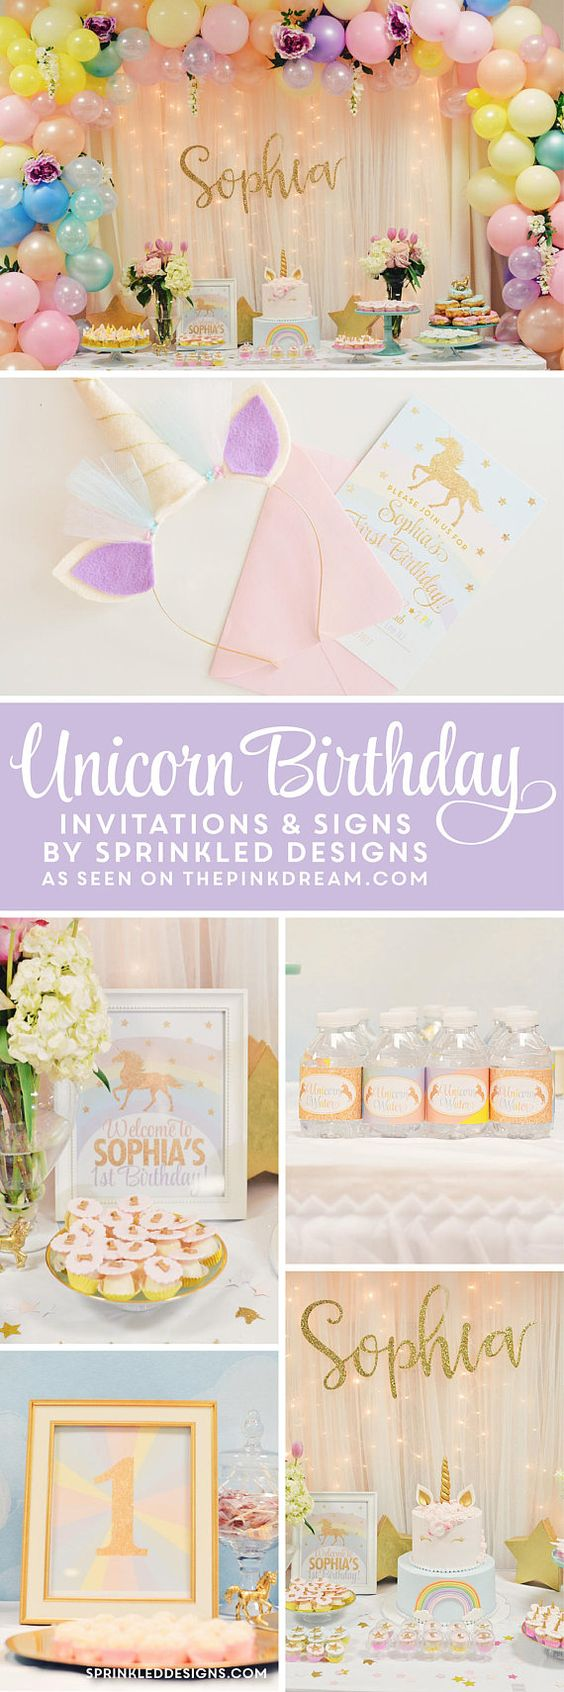 Unicorn Birthday Invitation, Unicorn Invitation, Unicorn Party ...